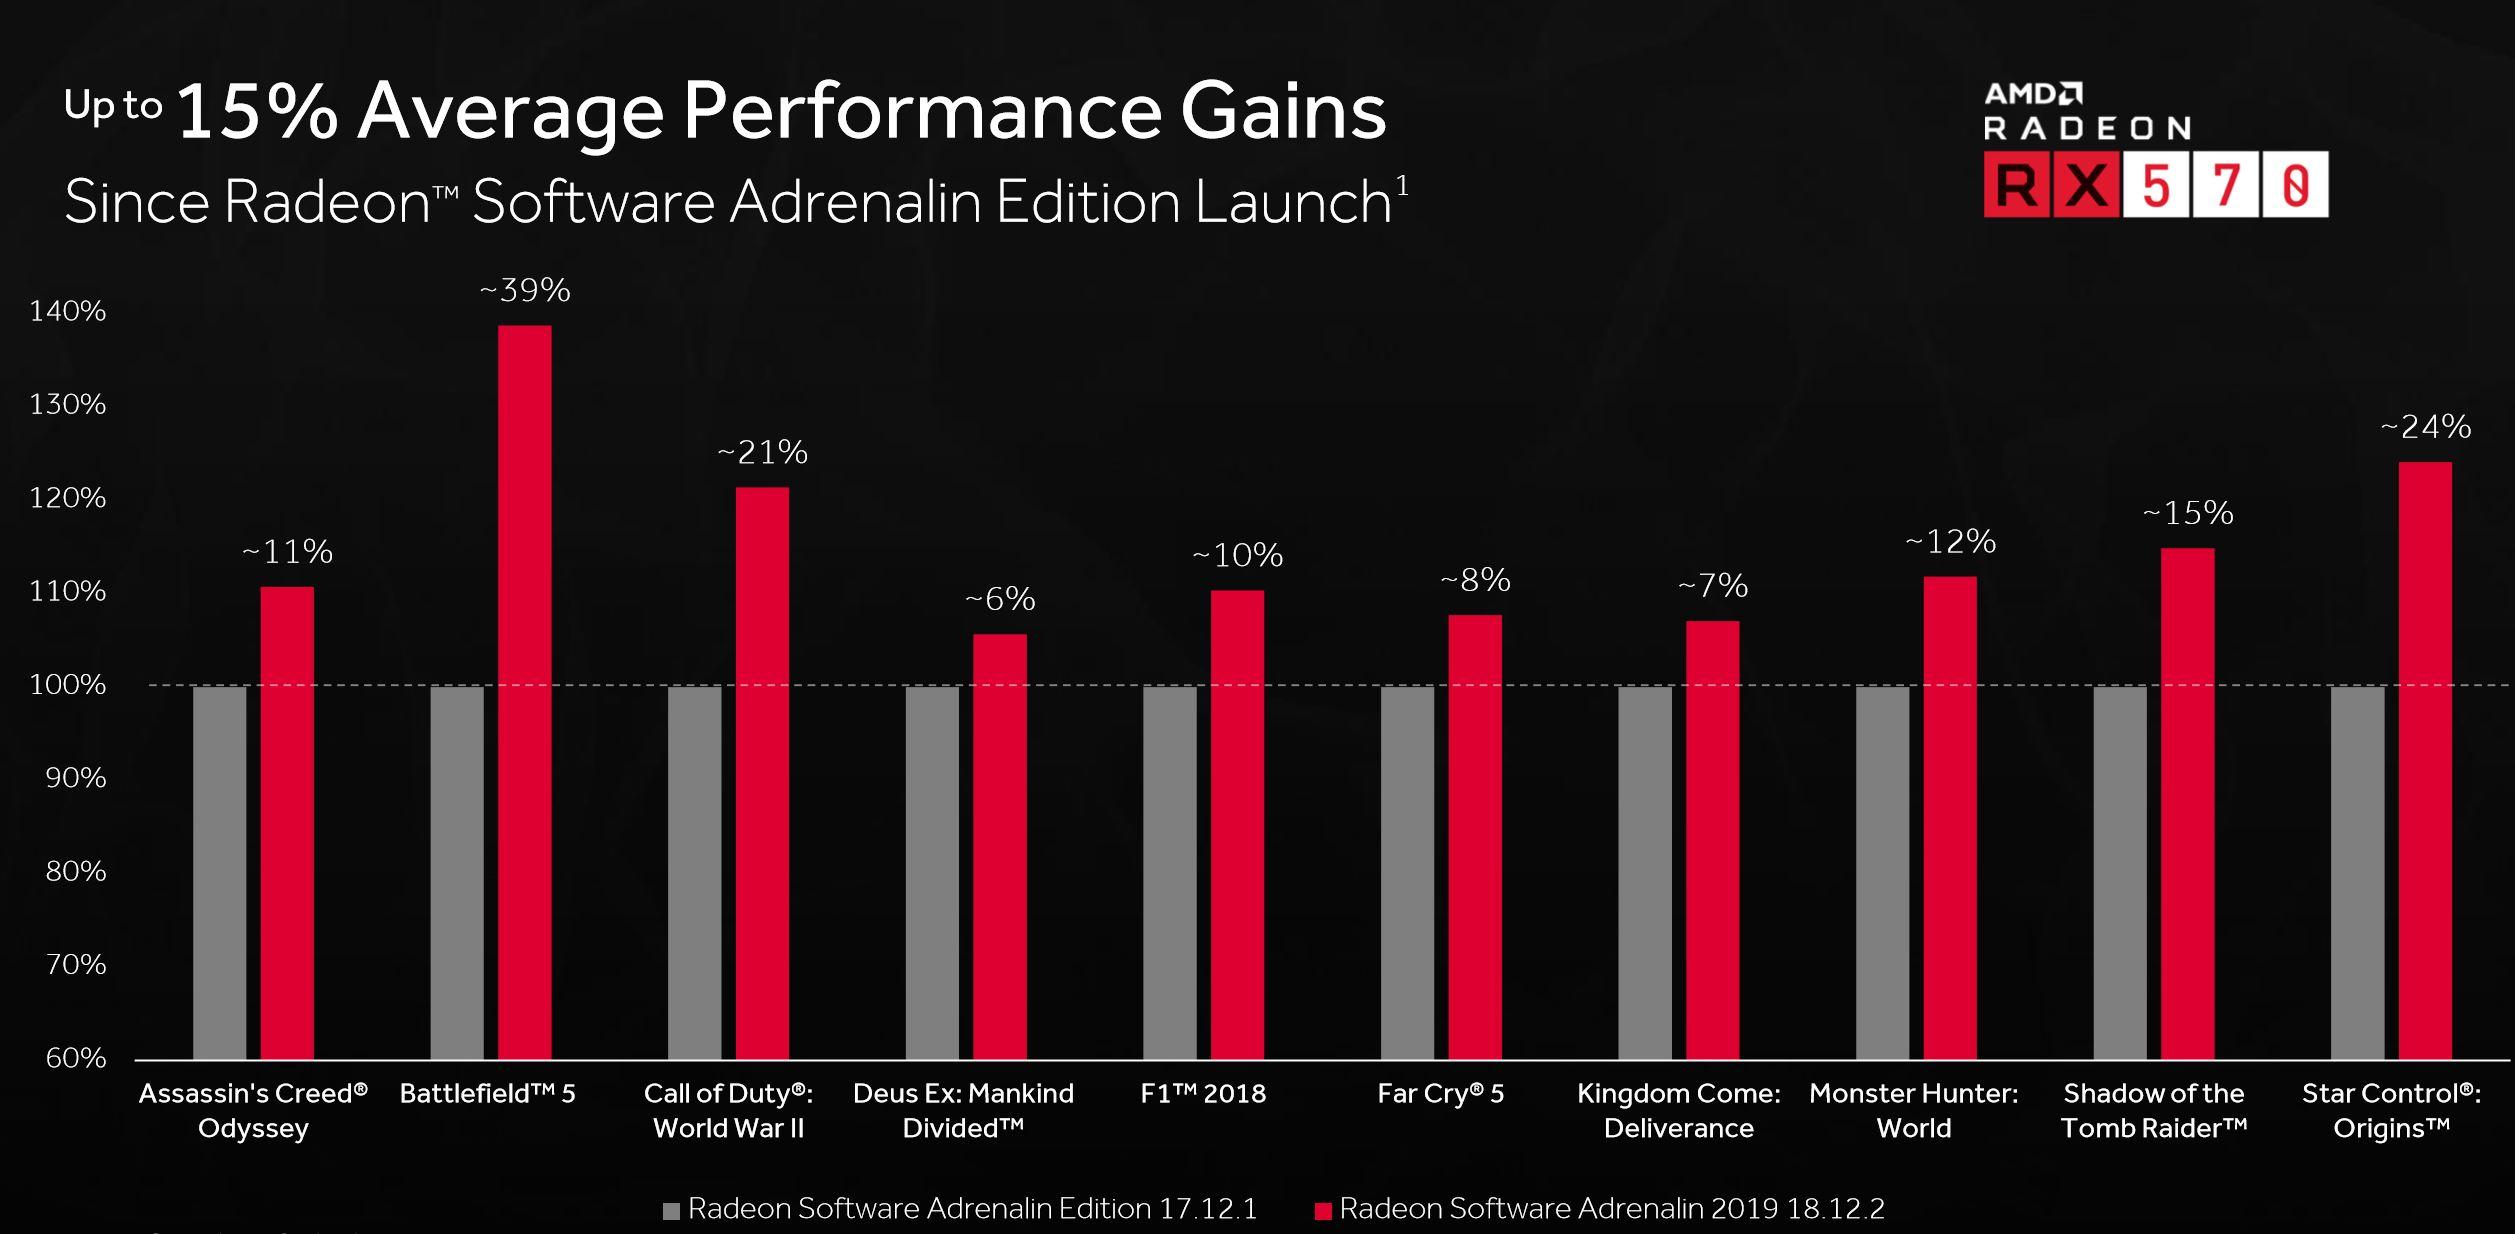 Radeon Software Adrenalin 2019 Edition